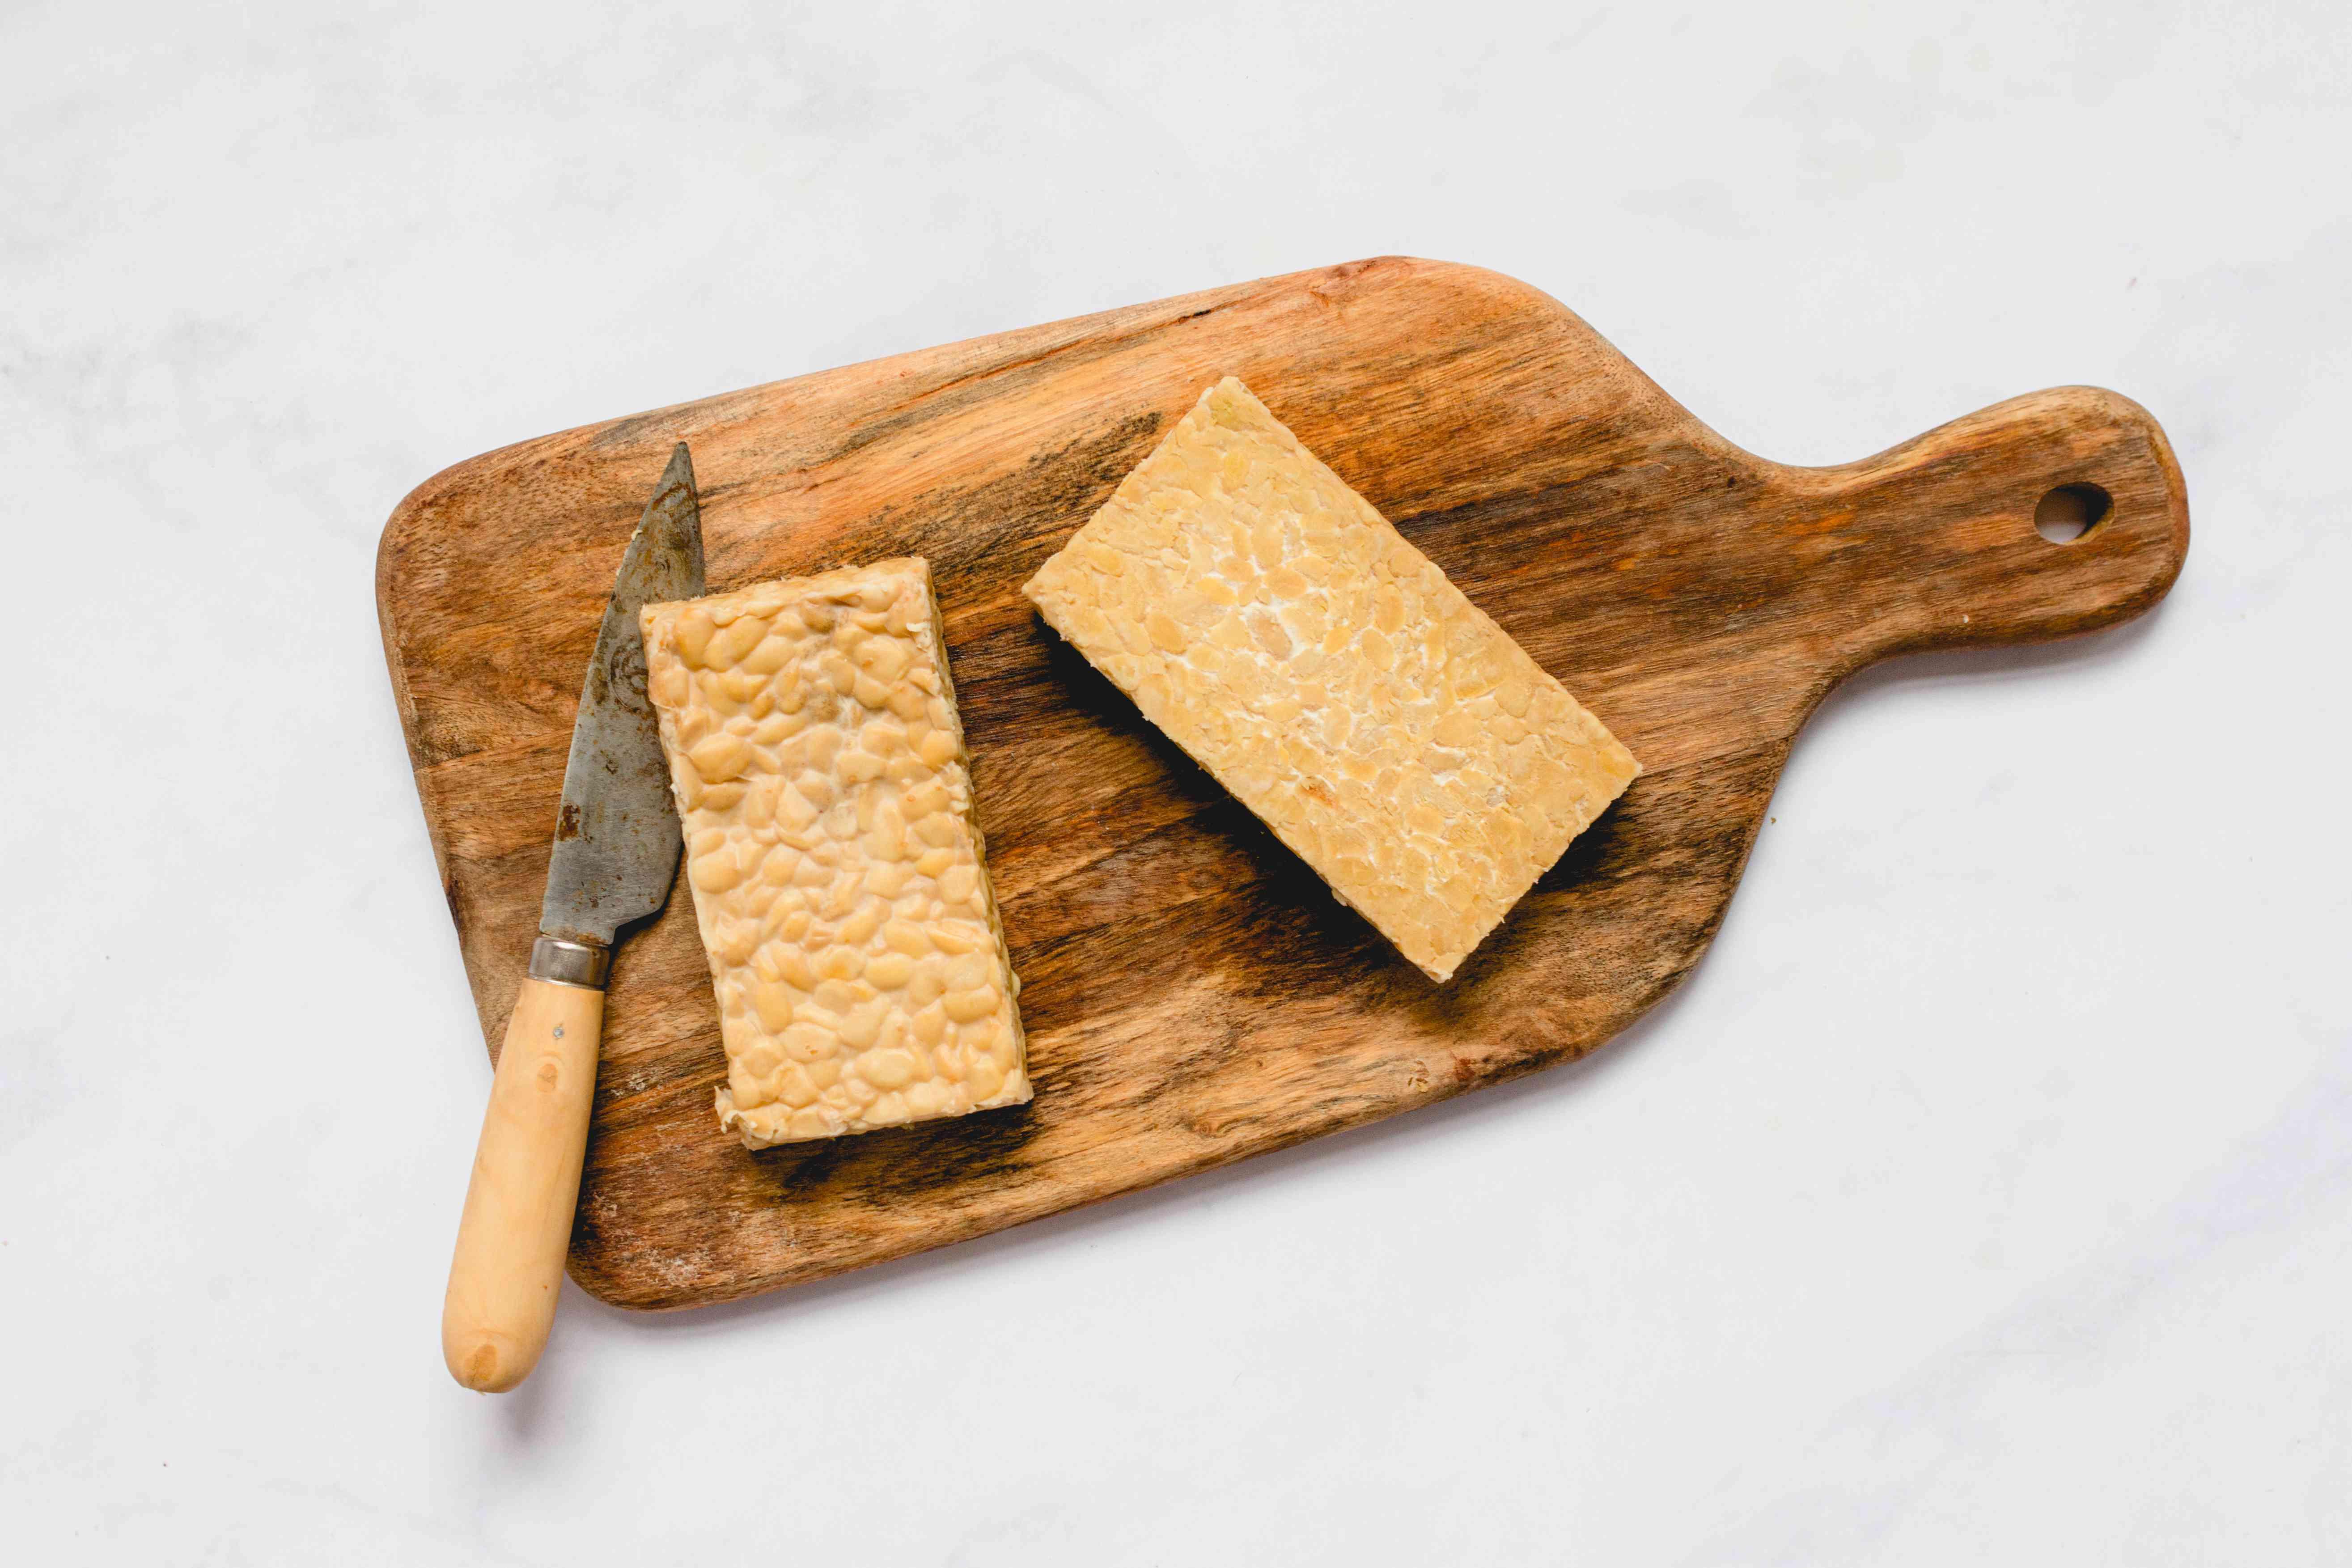 tempeh on a cutting board